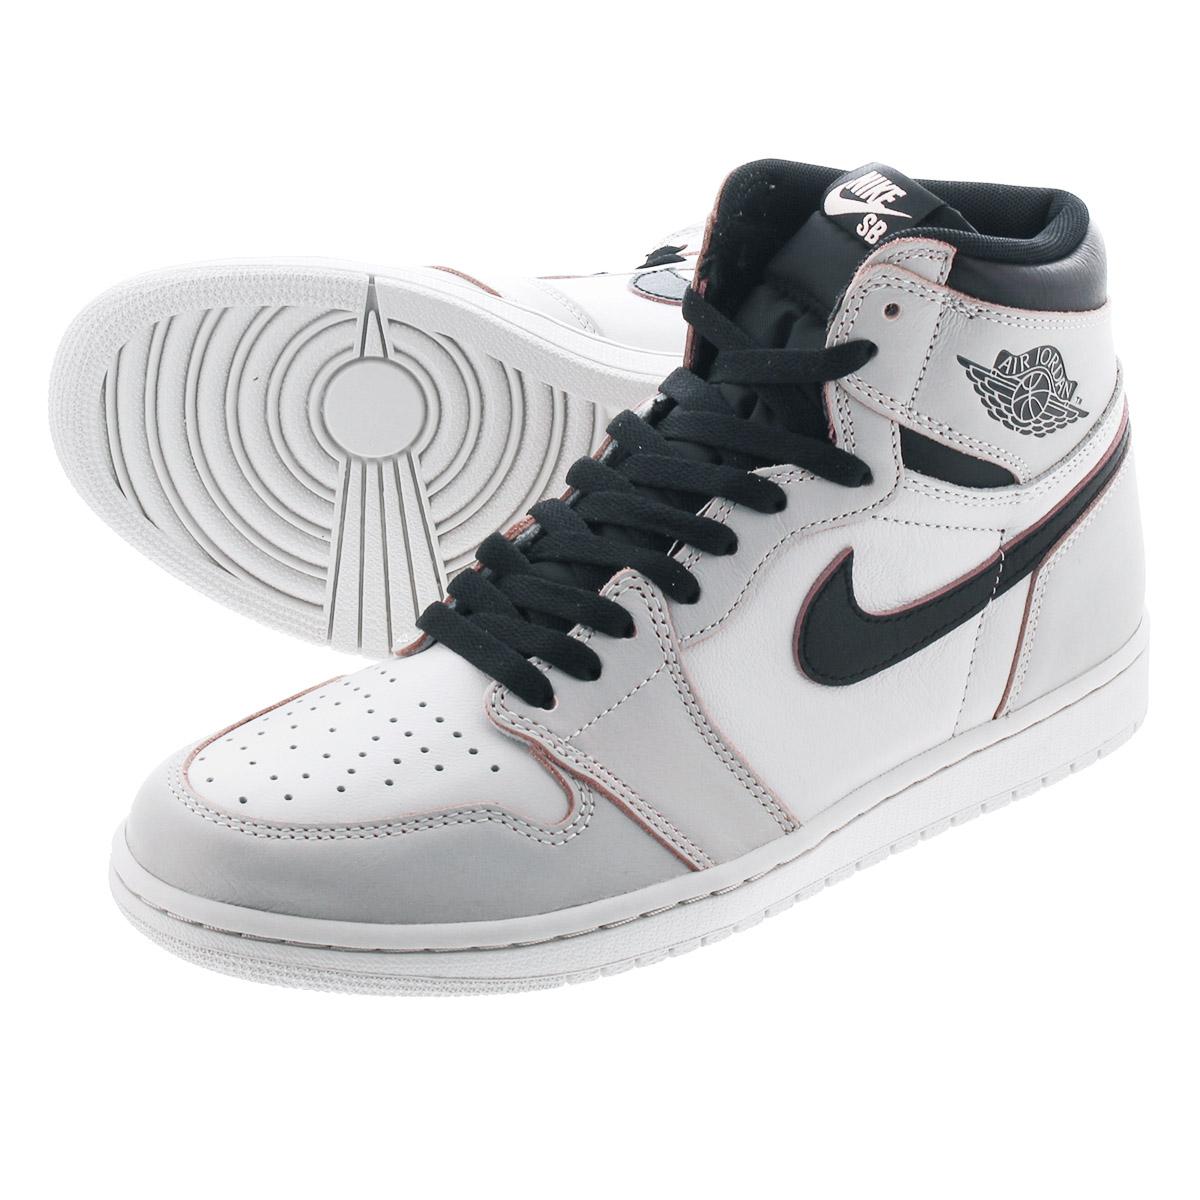 NIKE SB AIR JORDAN 1 RETRO HIGH OG DEFIANT Nike SB Air Jordan 1 nostalgic  high OG ディファイアント LIGHT BONE/CRIMSON TINT/HYPER PINK cd6578-006